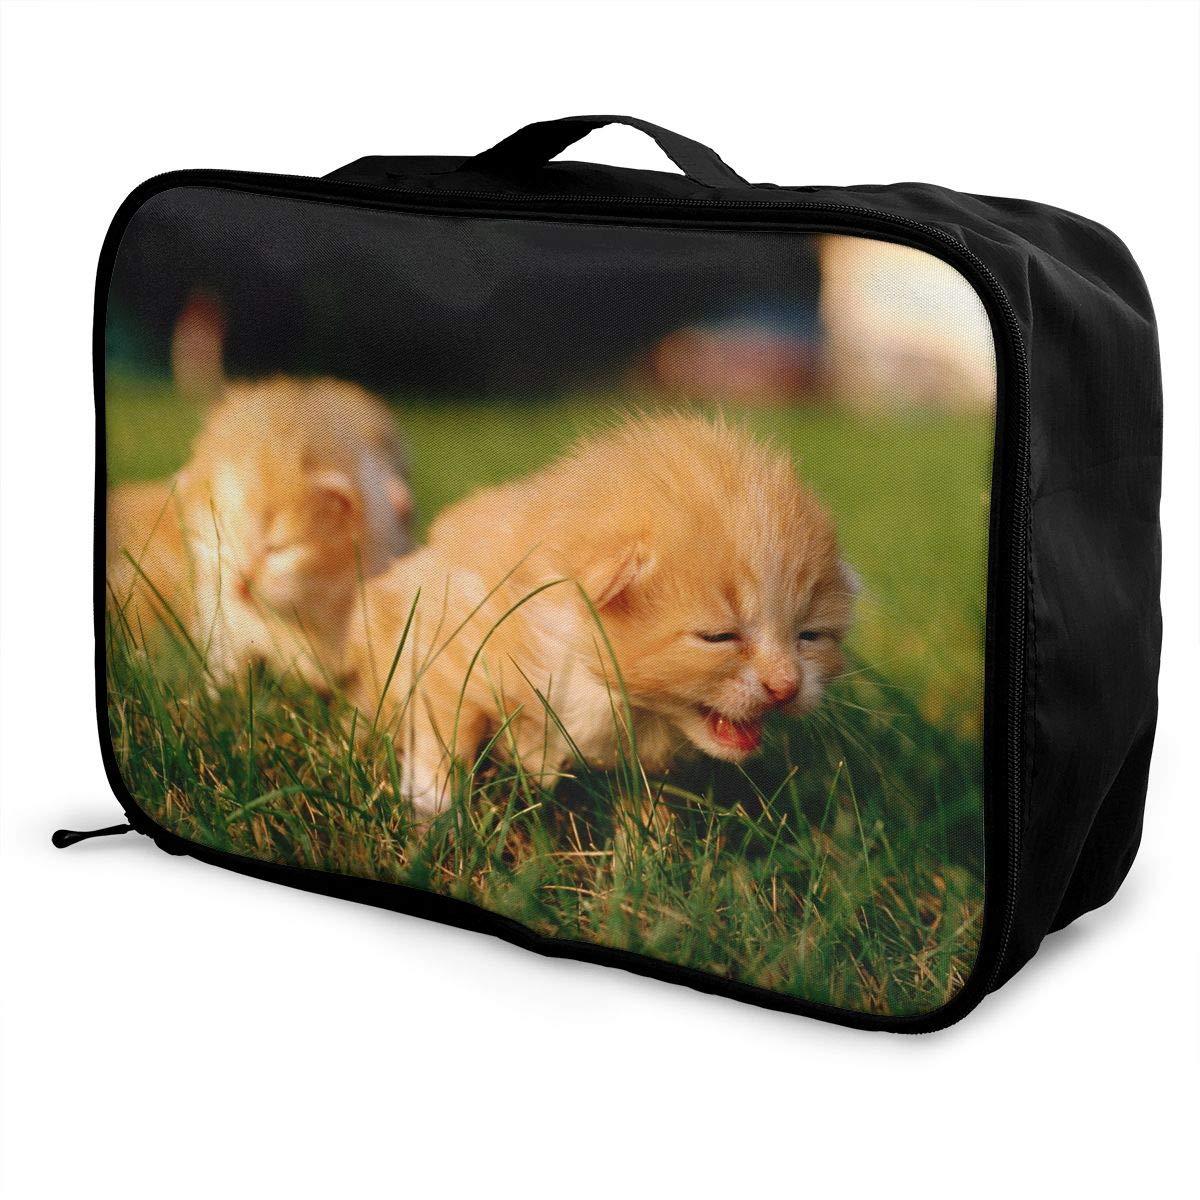 Travel Luggage Duffle Bag Lightweight Portable Handbag Cute Kitten Print Large Capacity Waterproof Foldable Storage Tote